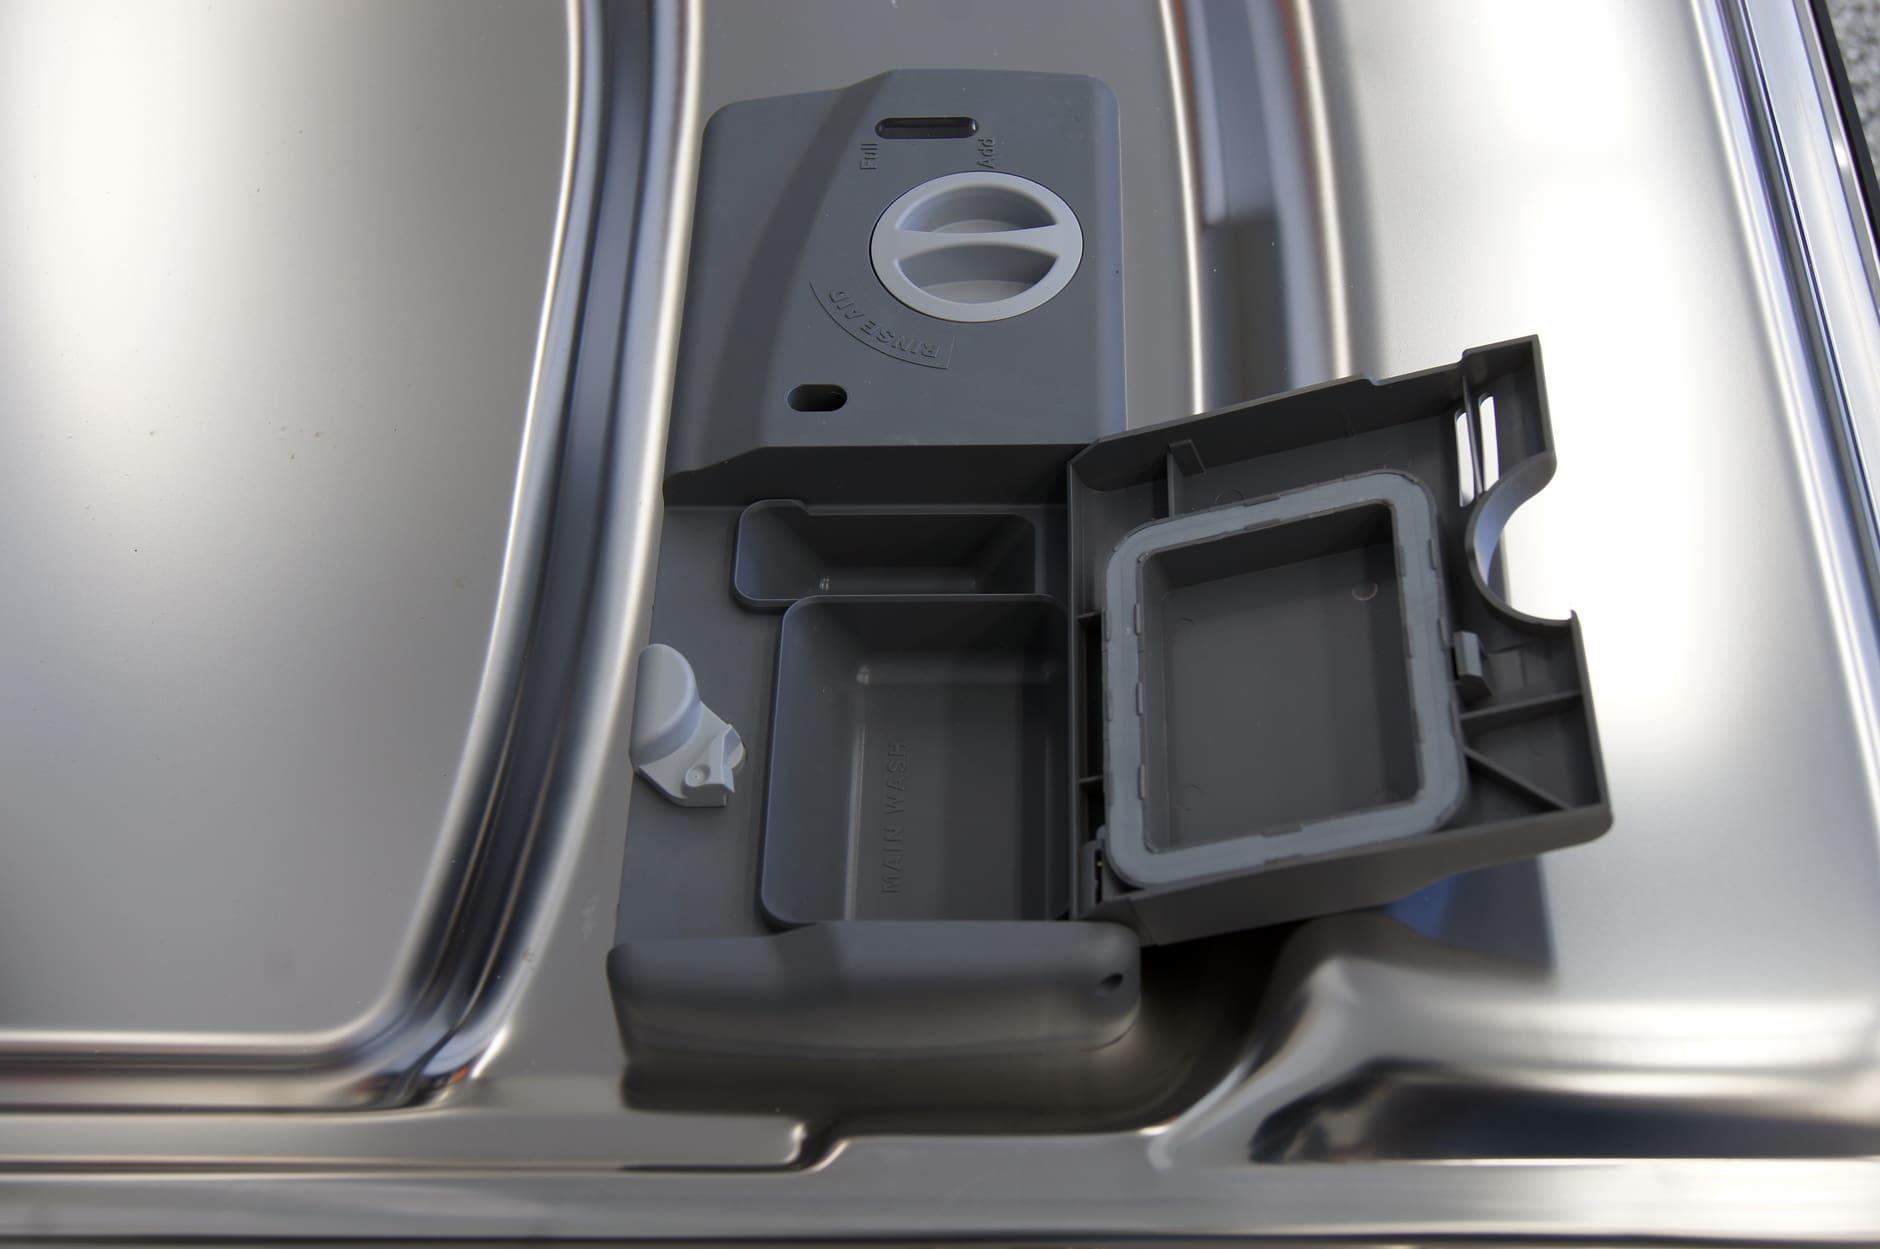 Kenmore Elite 14683 detergent and rinse aid dispenser